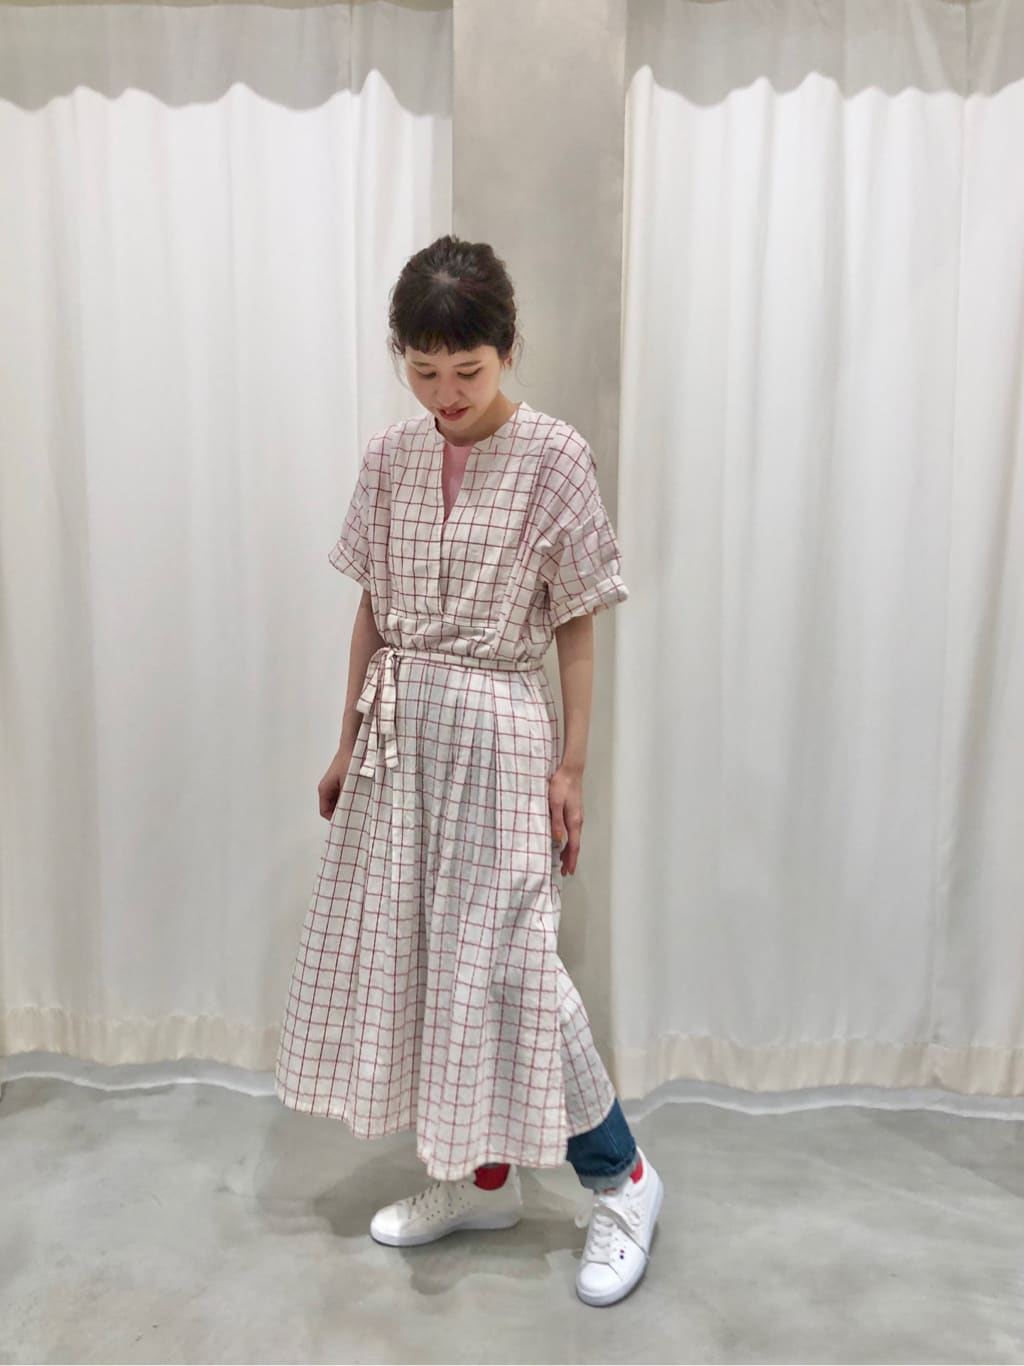 - CHILD WOMAN CHILD WOMAN , PAR ICI 東京スカイツリータウン・ソラマチ 身長:160cm 2021.07.12